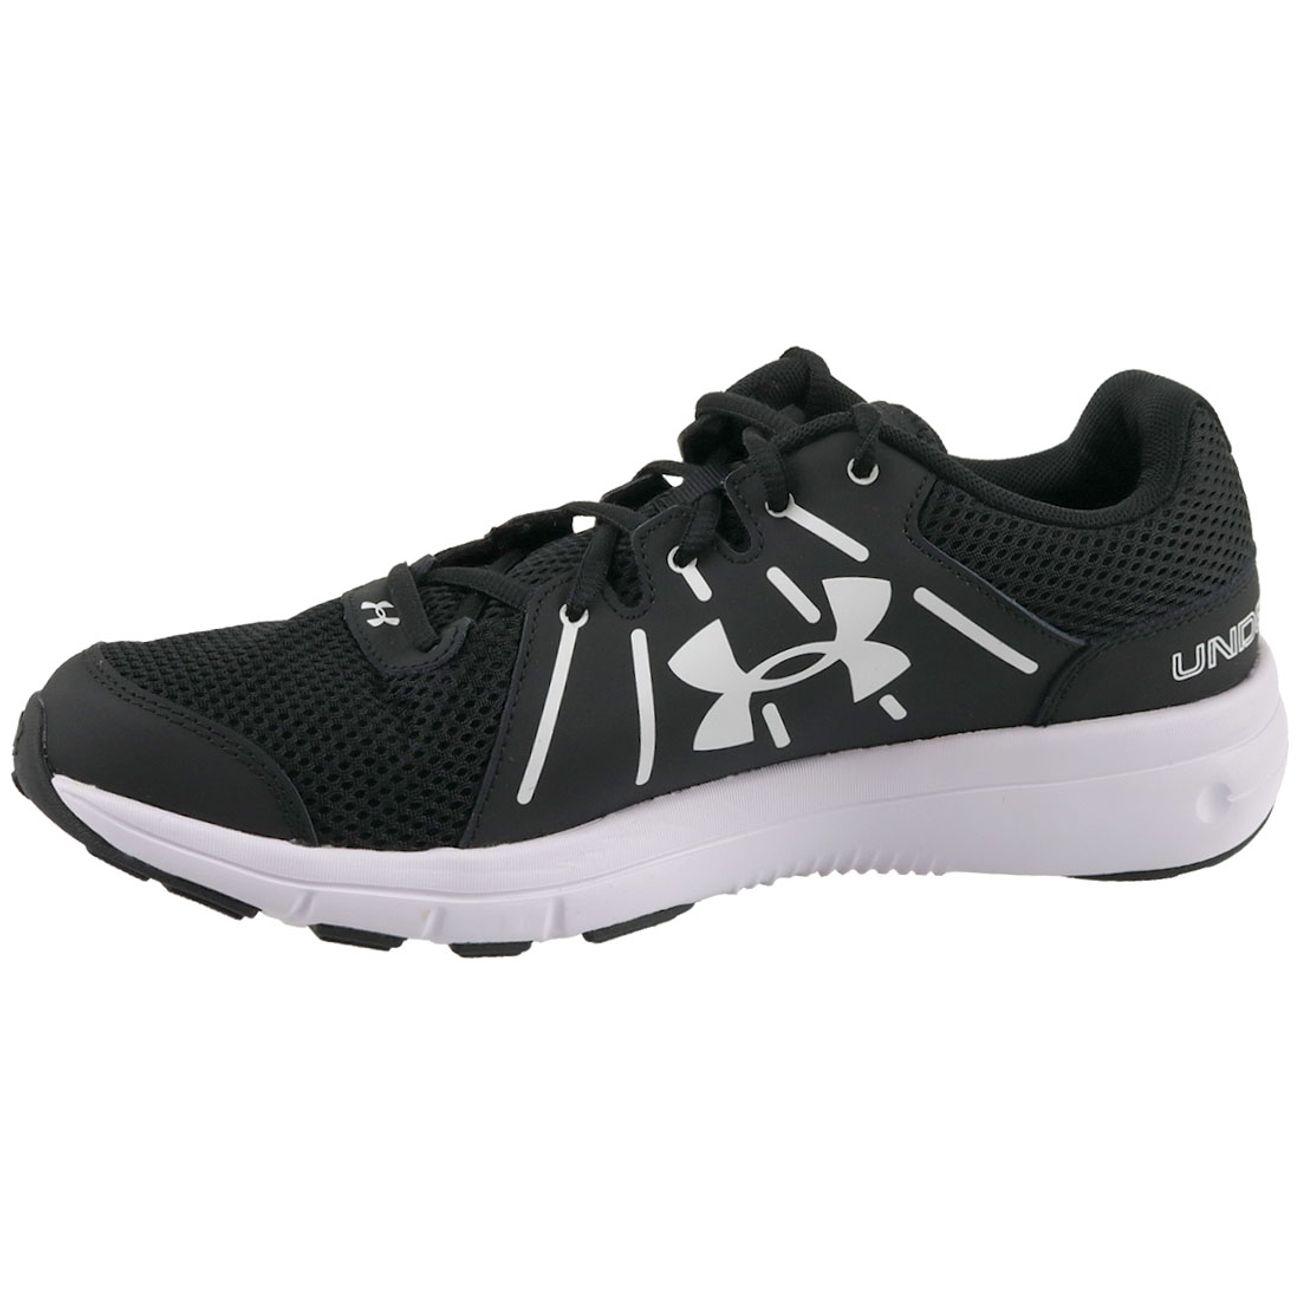 Chaussures De Running Noir Dash Rn 2 001 blanc Ua Homme Under Armour 1285671 L54AR3jq